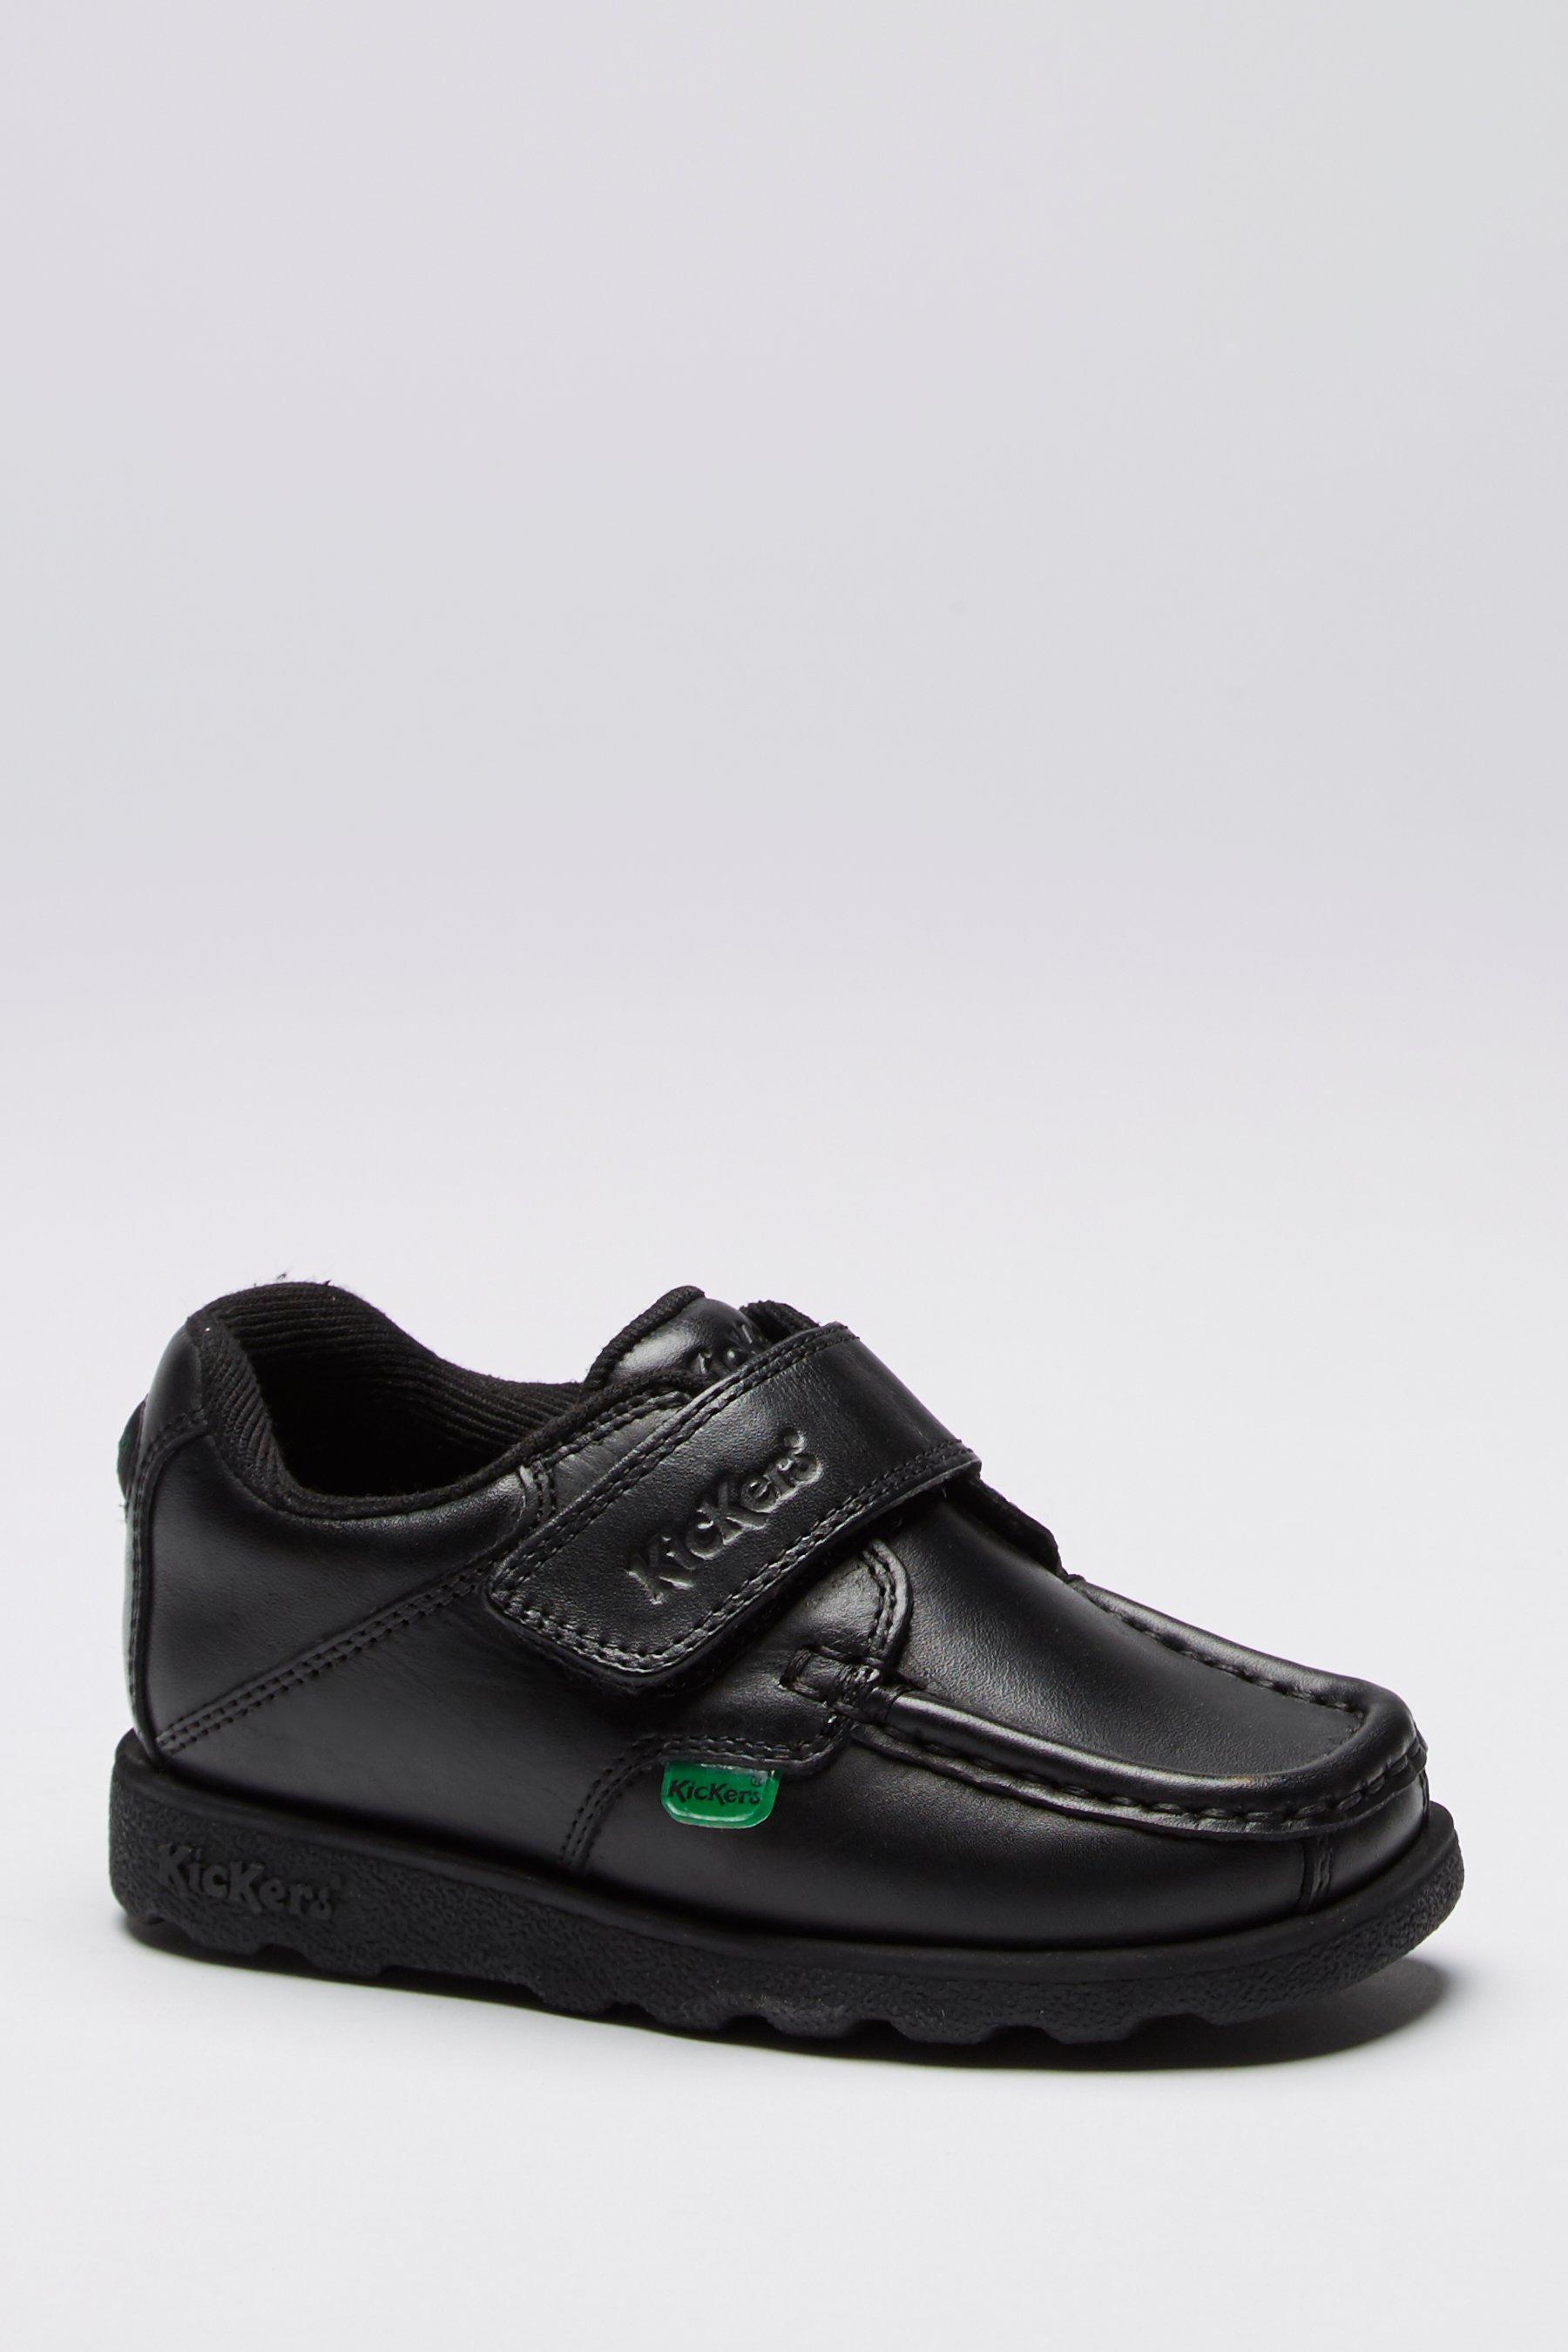 Boys Infant Kickers Fragma Strap Shoes